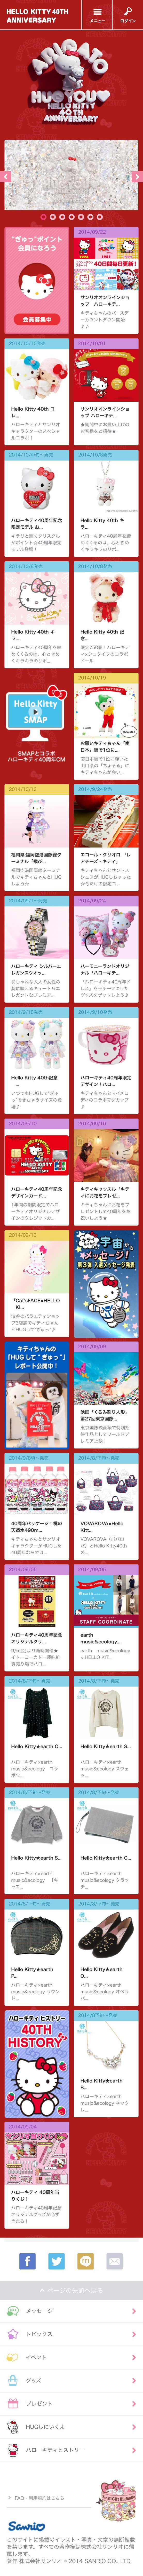 http://kitty40th.sanrio.co.jp/